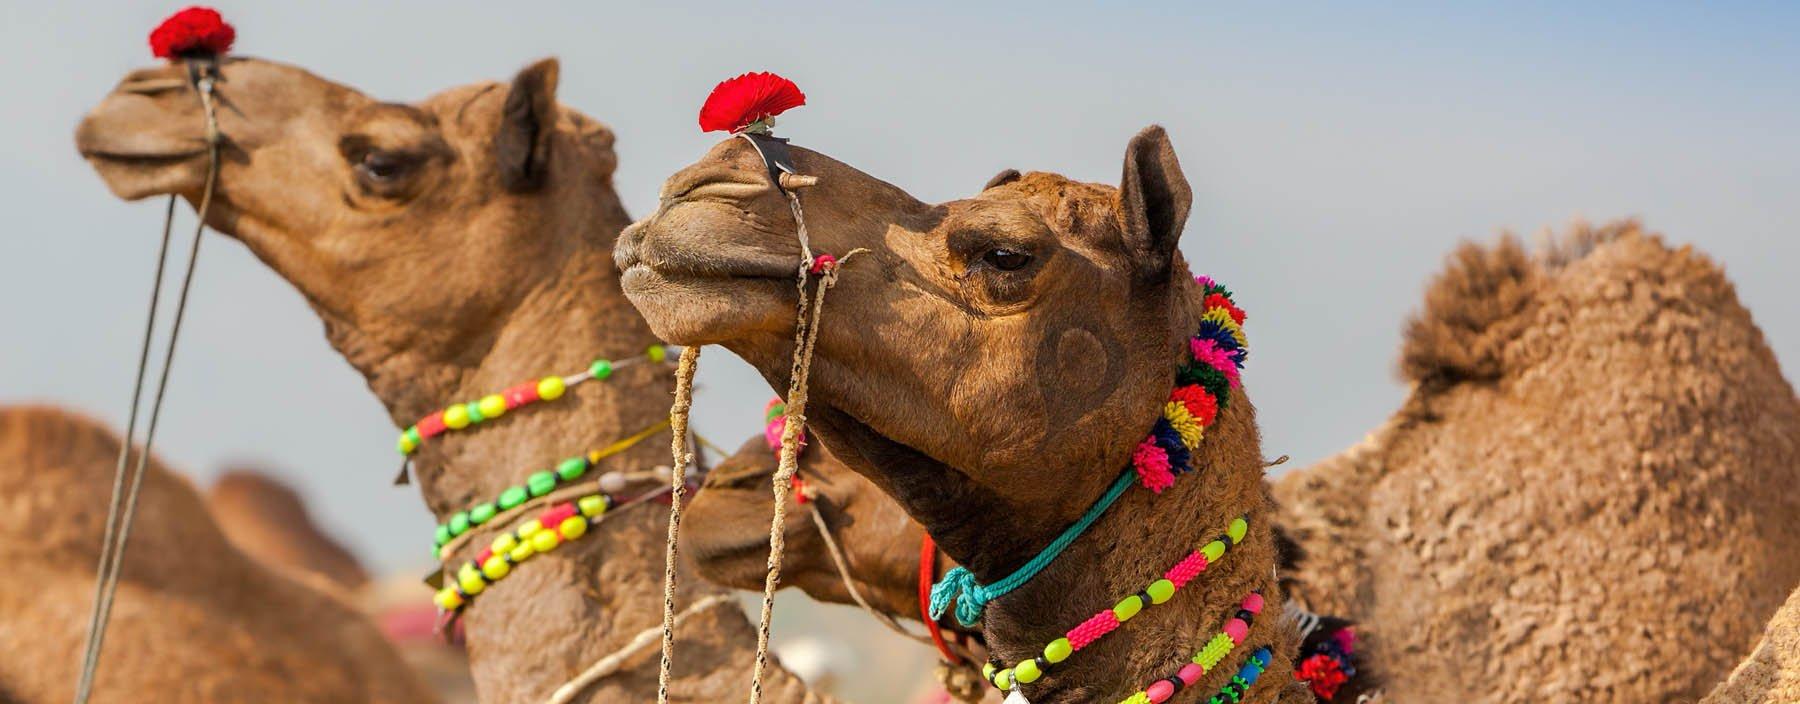 in, pushkar, camels at the pushkar fair.jpg